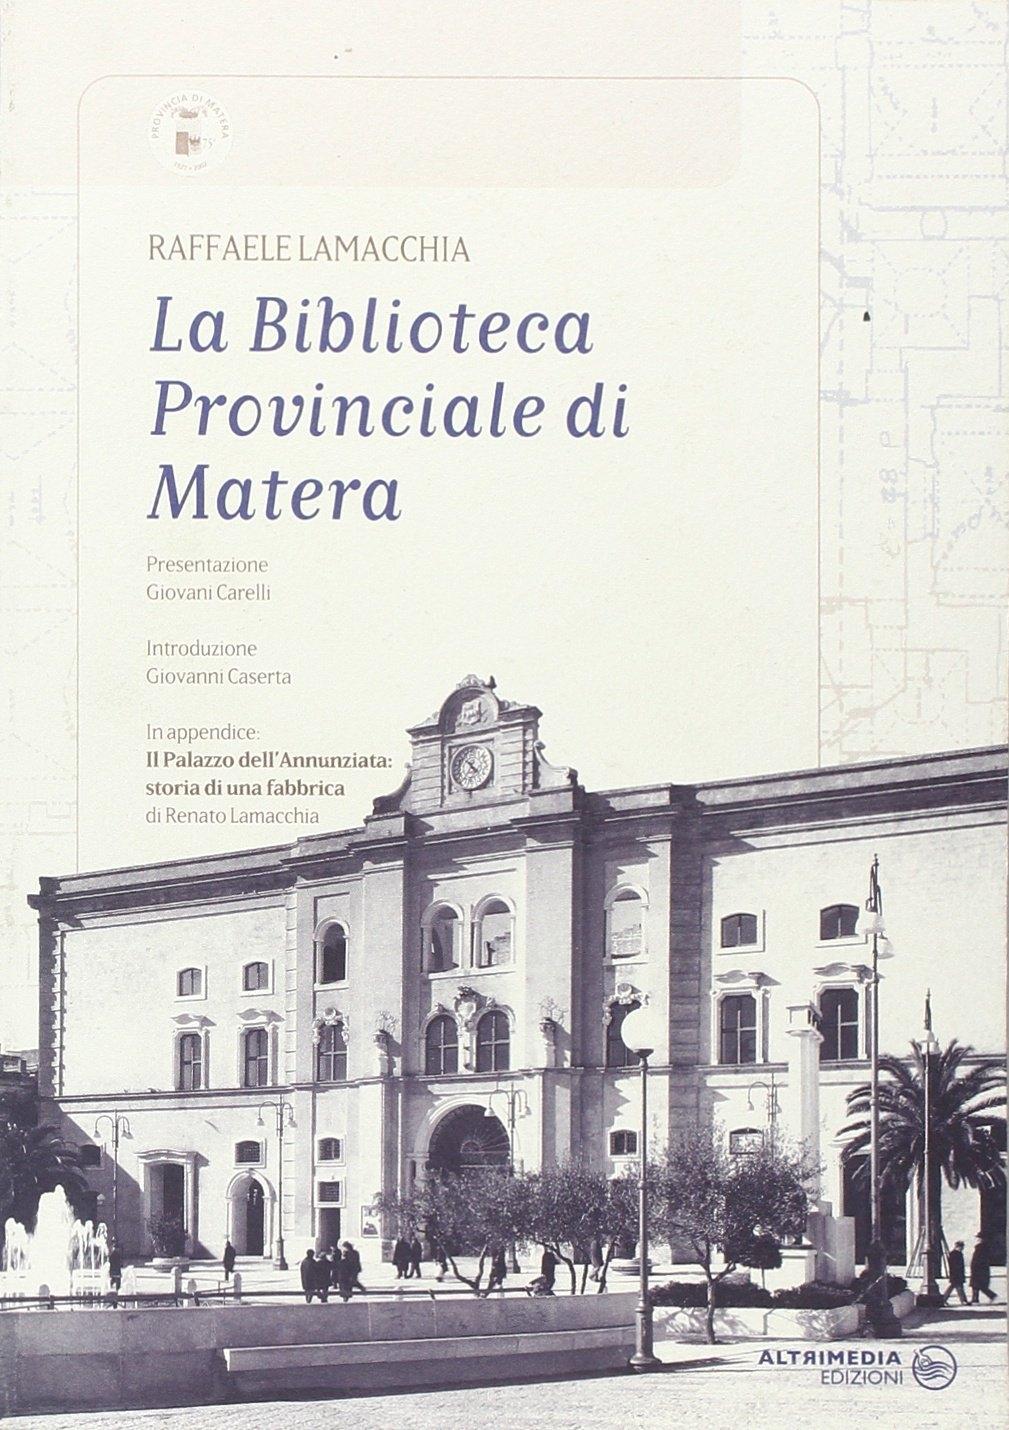 La Biblioteca provinciale di Matera